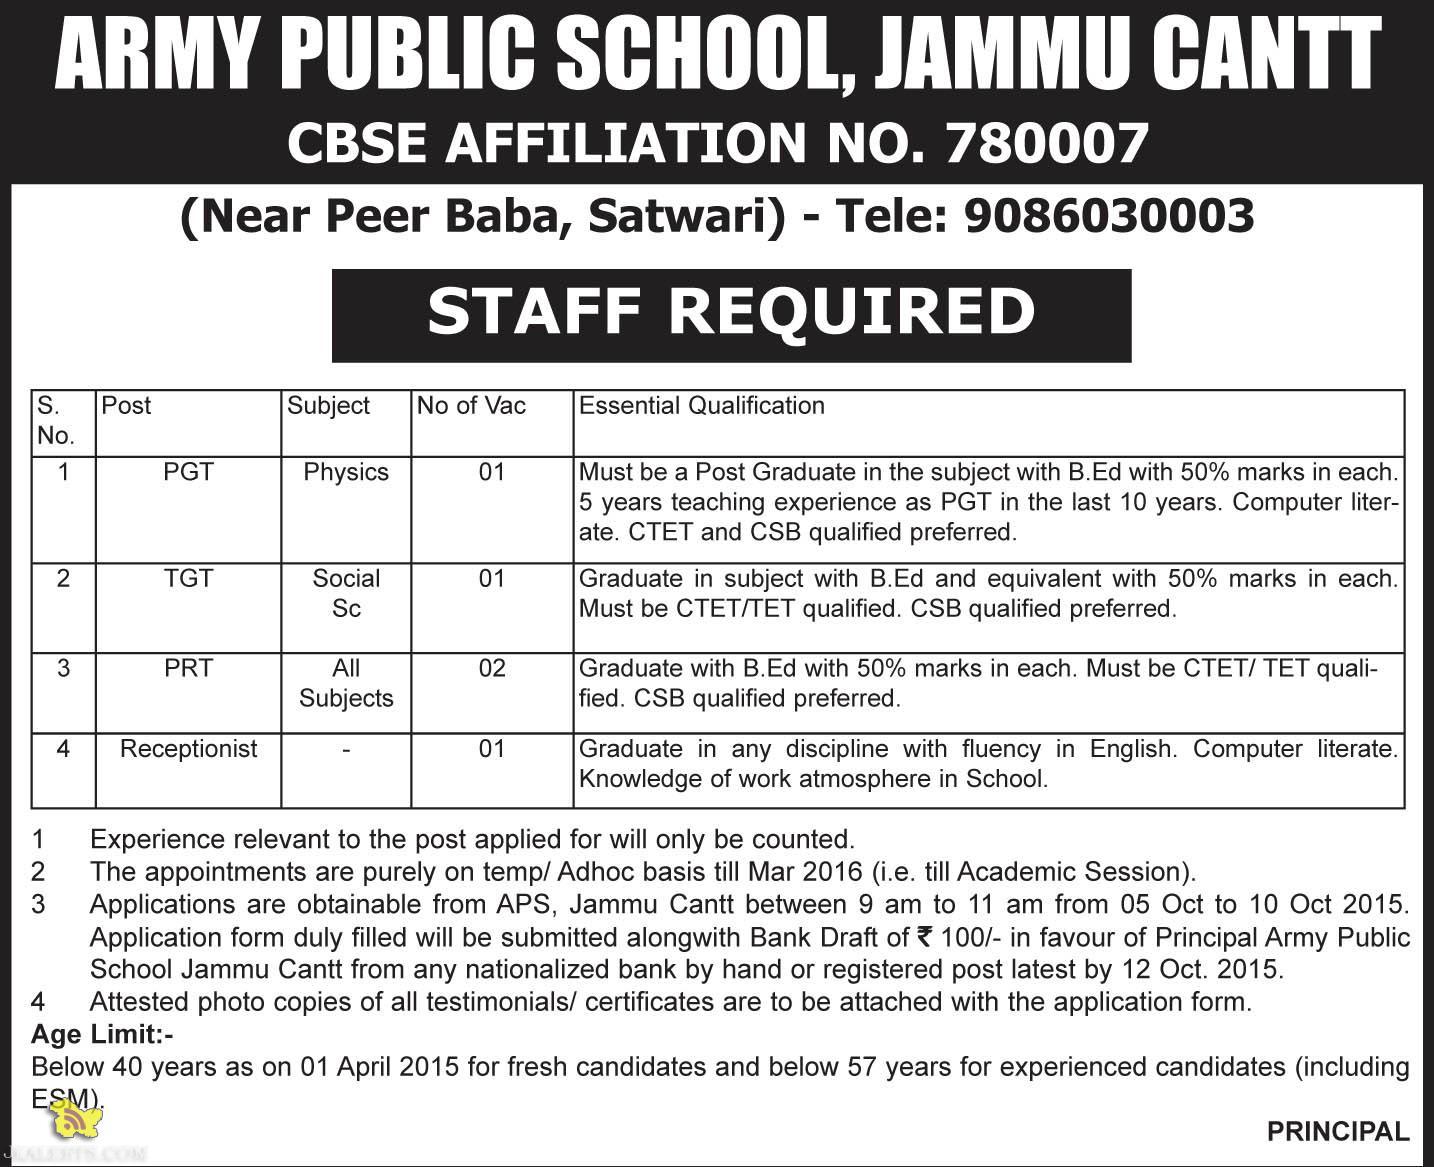 PGT, TGT, PRT, Receptionist Jobs in ARMY PUBLIC SCHOOL (APS), JAMMU CANTT